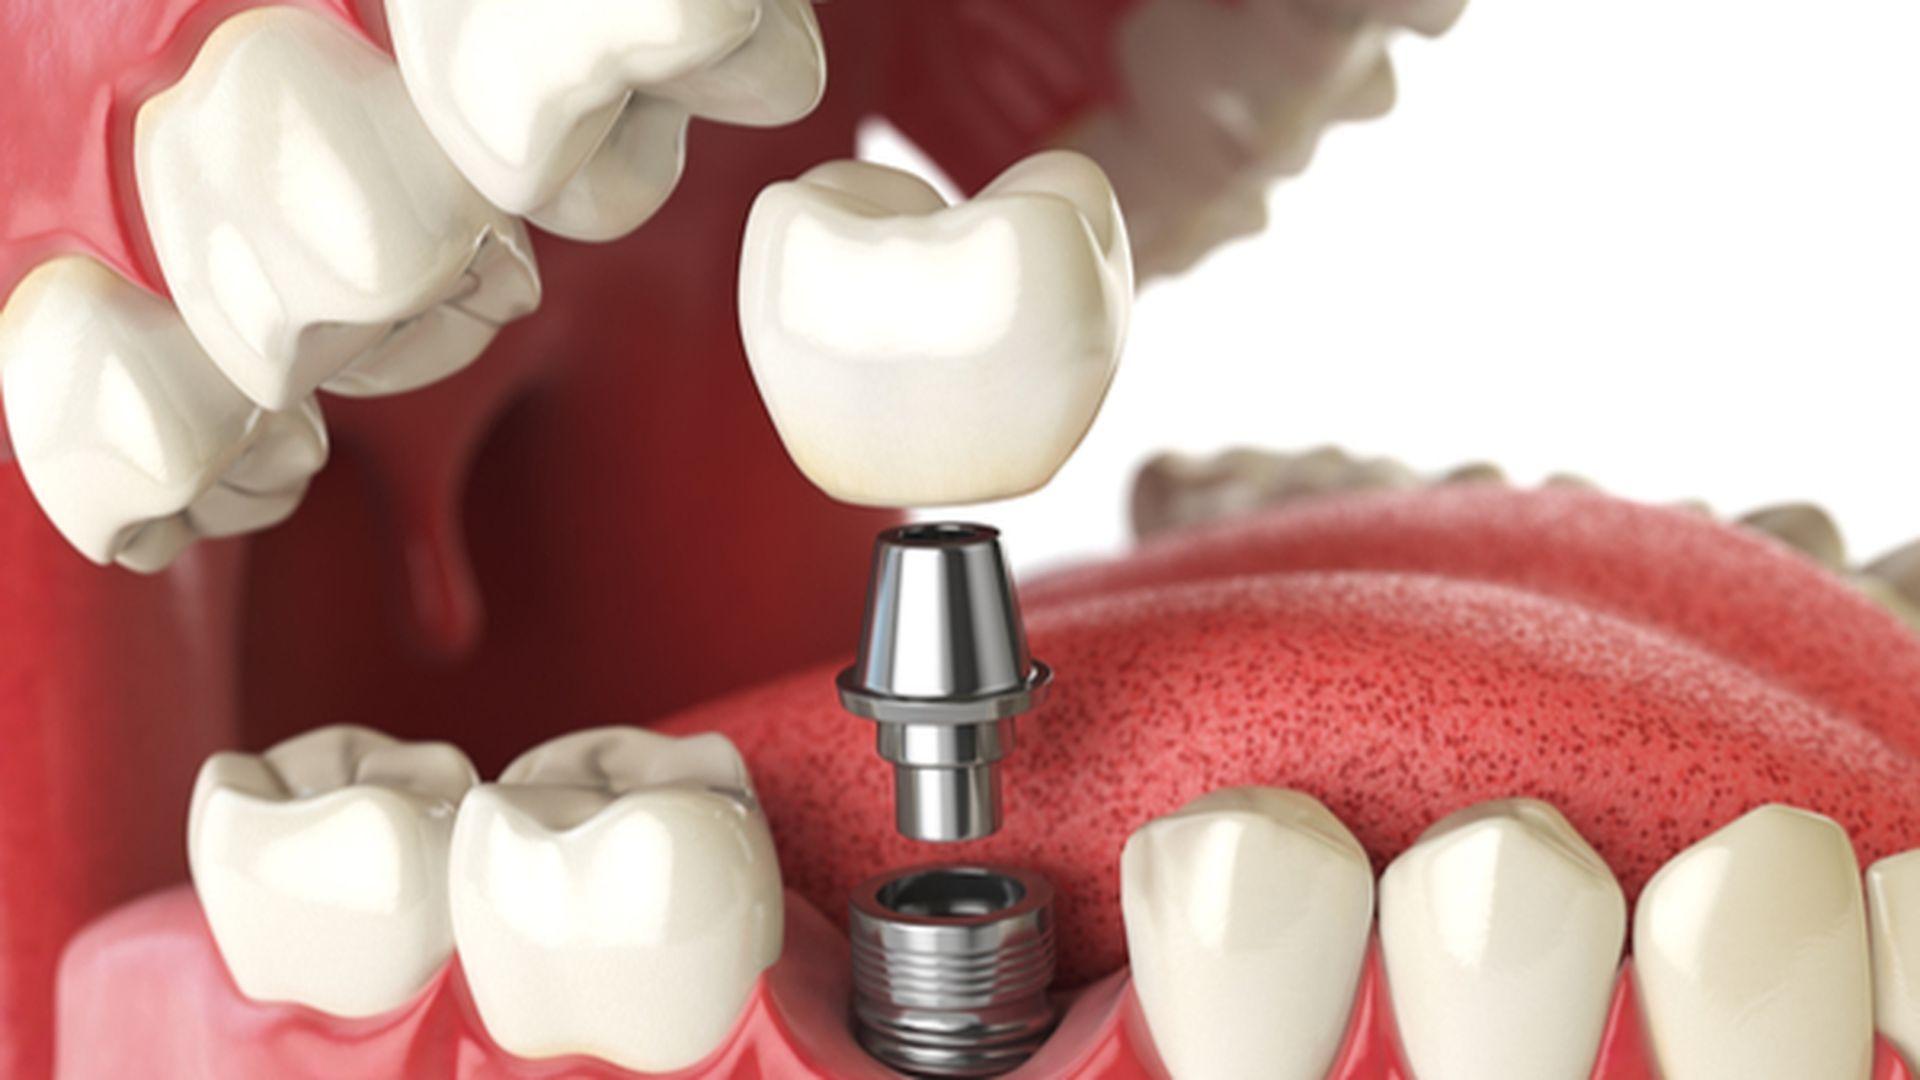 dental implant treatments waterloo - Dr. Stephen Mathews - Waterloo Dentist